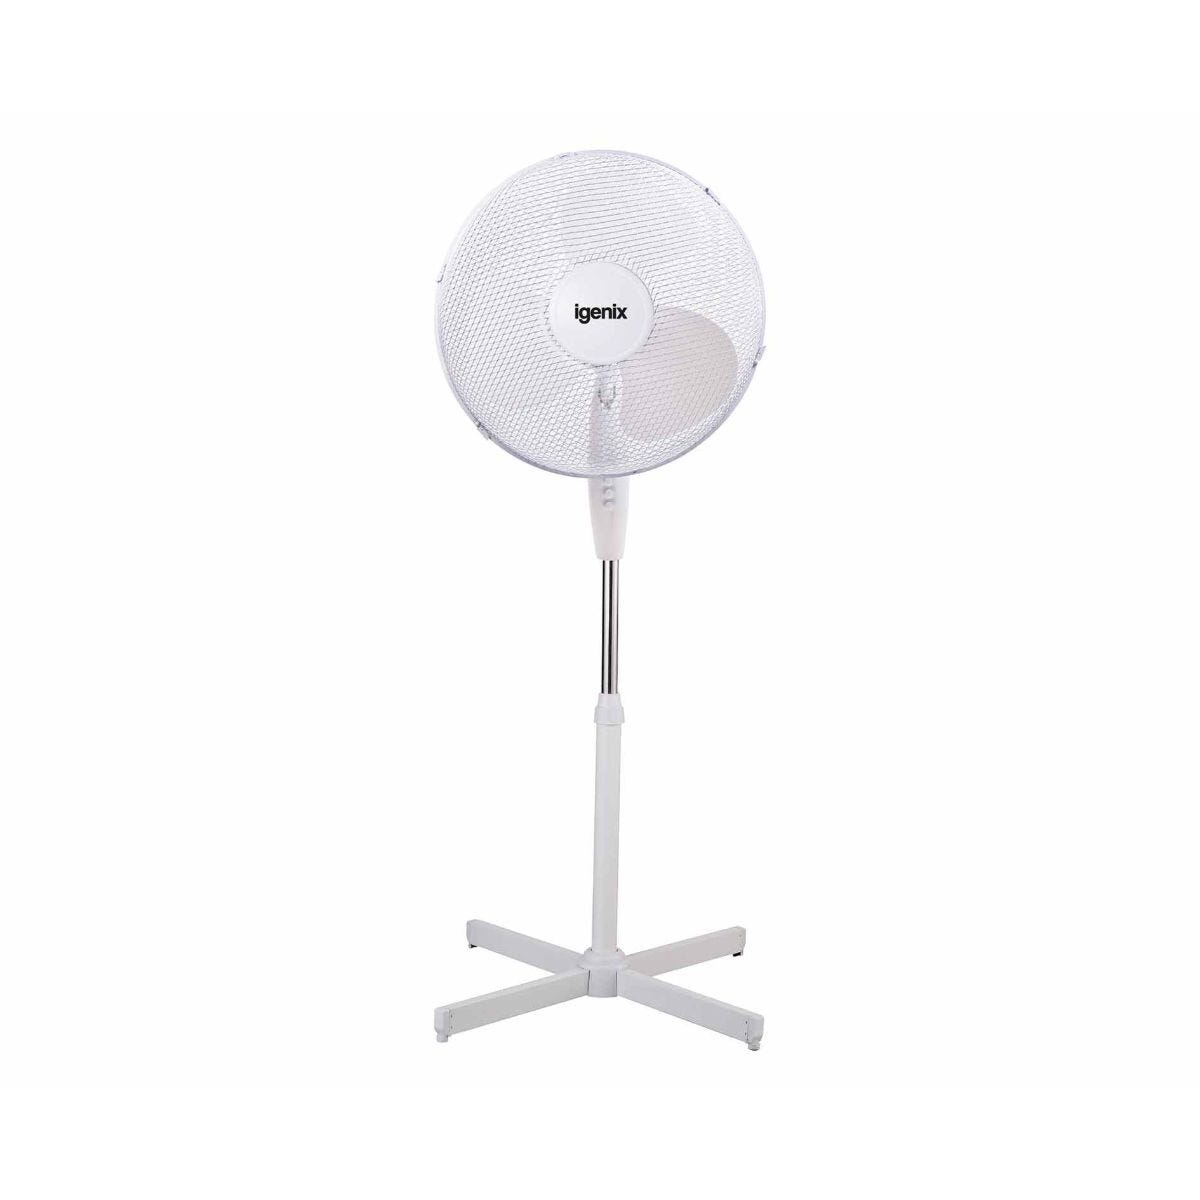 Igenix 16 inch Oscillating Pedestal Floor Fan